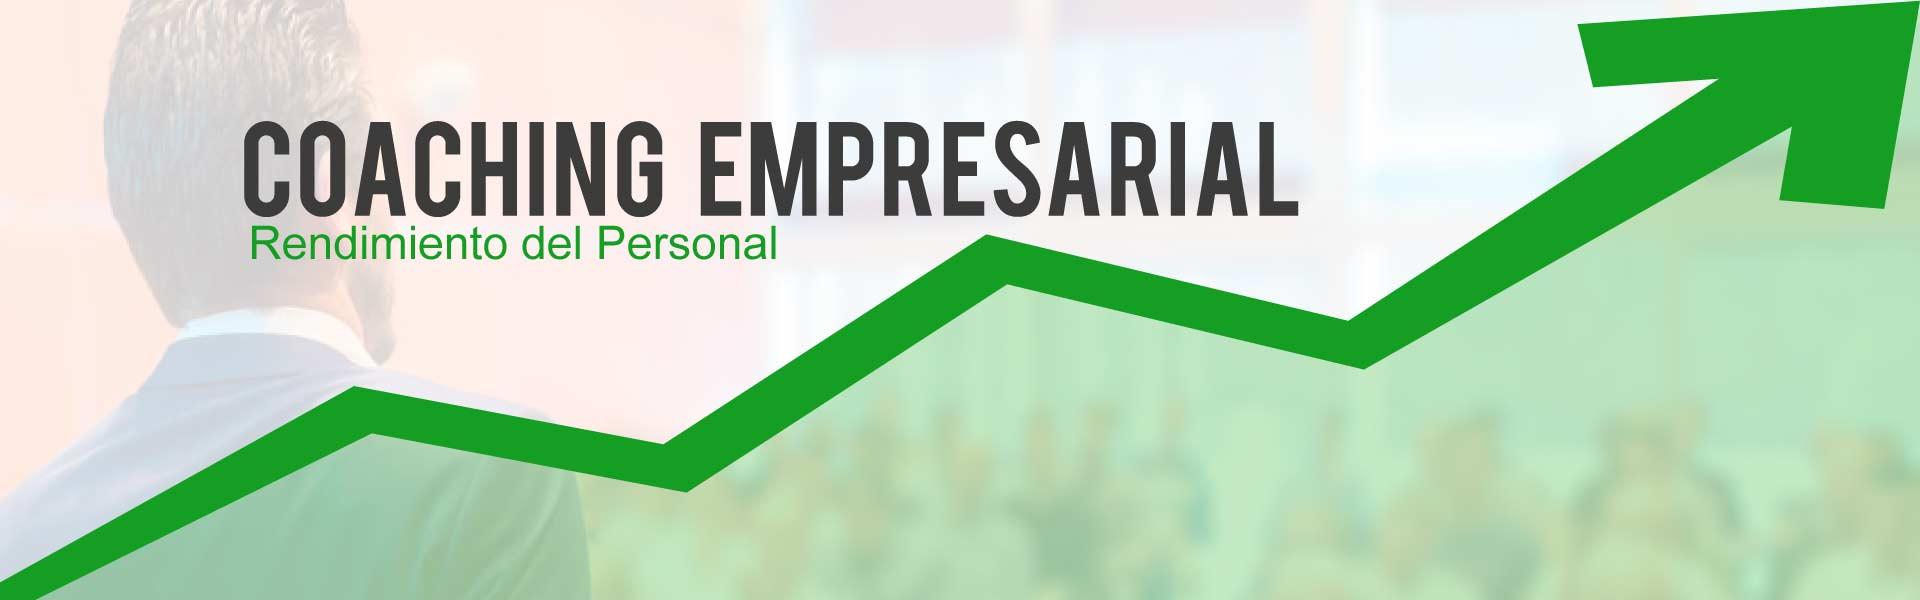 Coaching empresarial en Sevilla